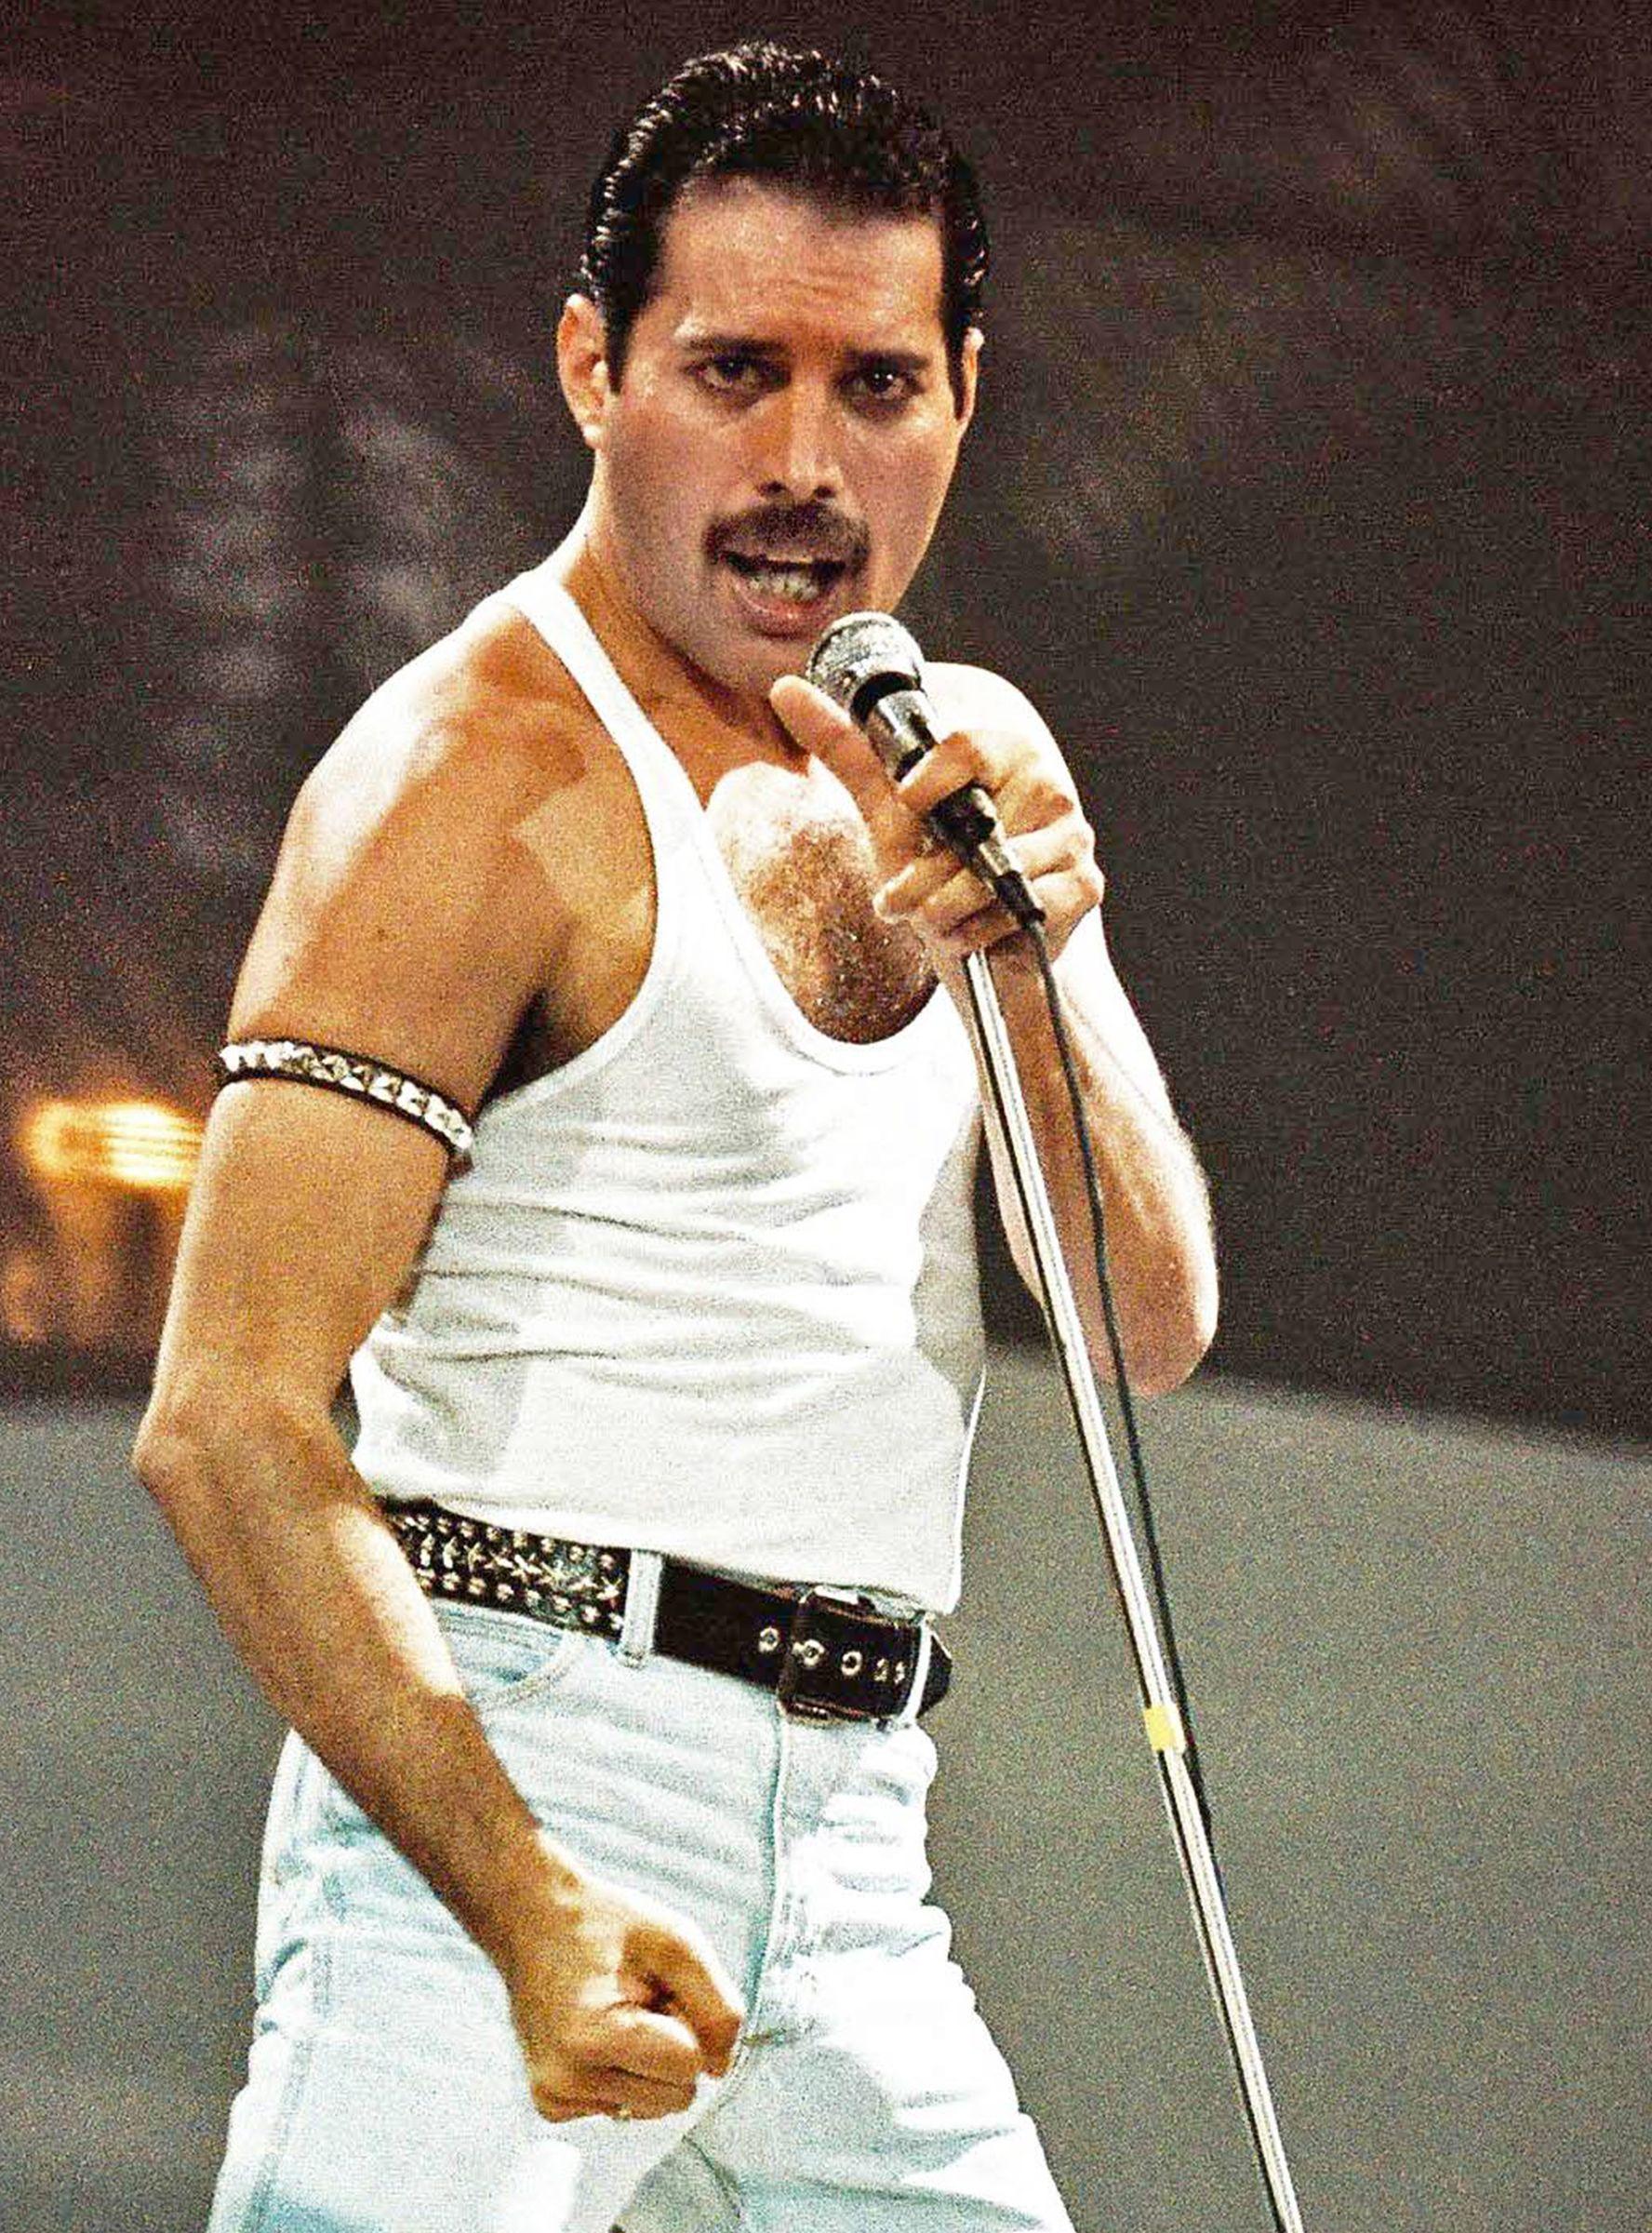 Freddie Mercury 33 British Singer Poster Signed Photo Queen Music Star on Stage